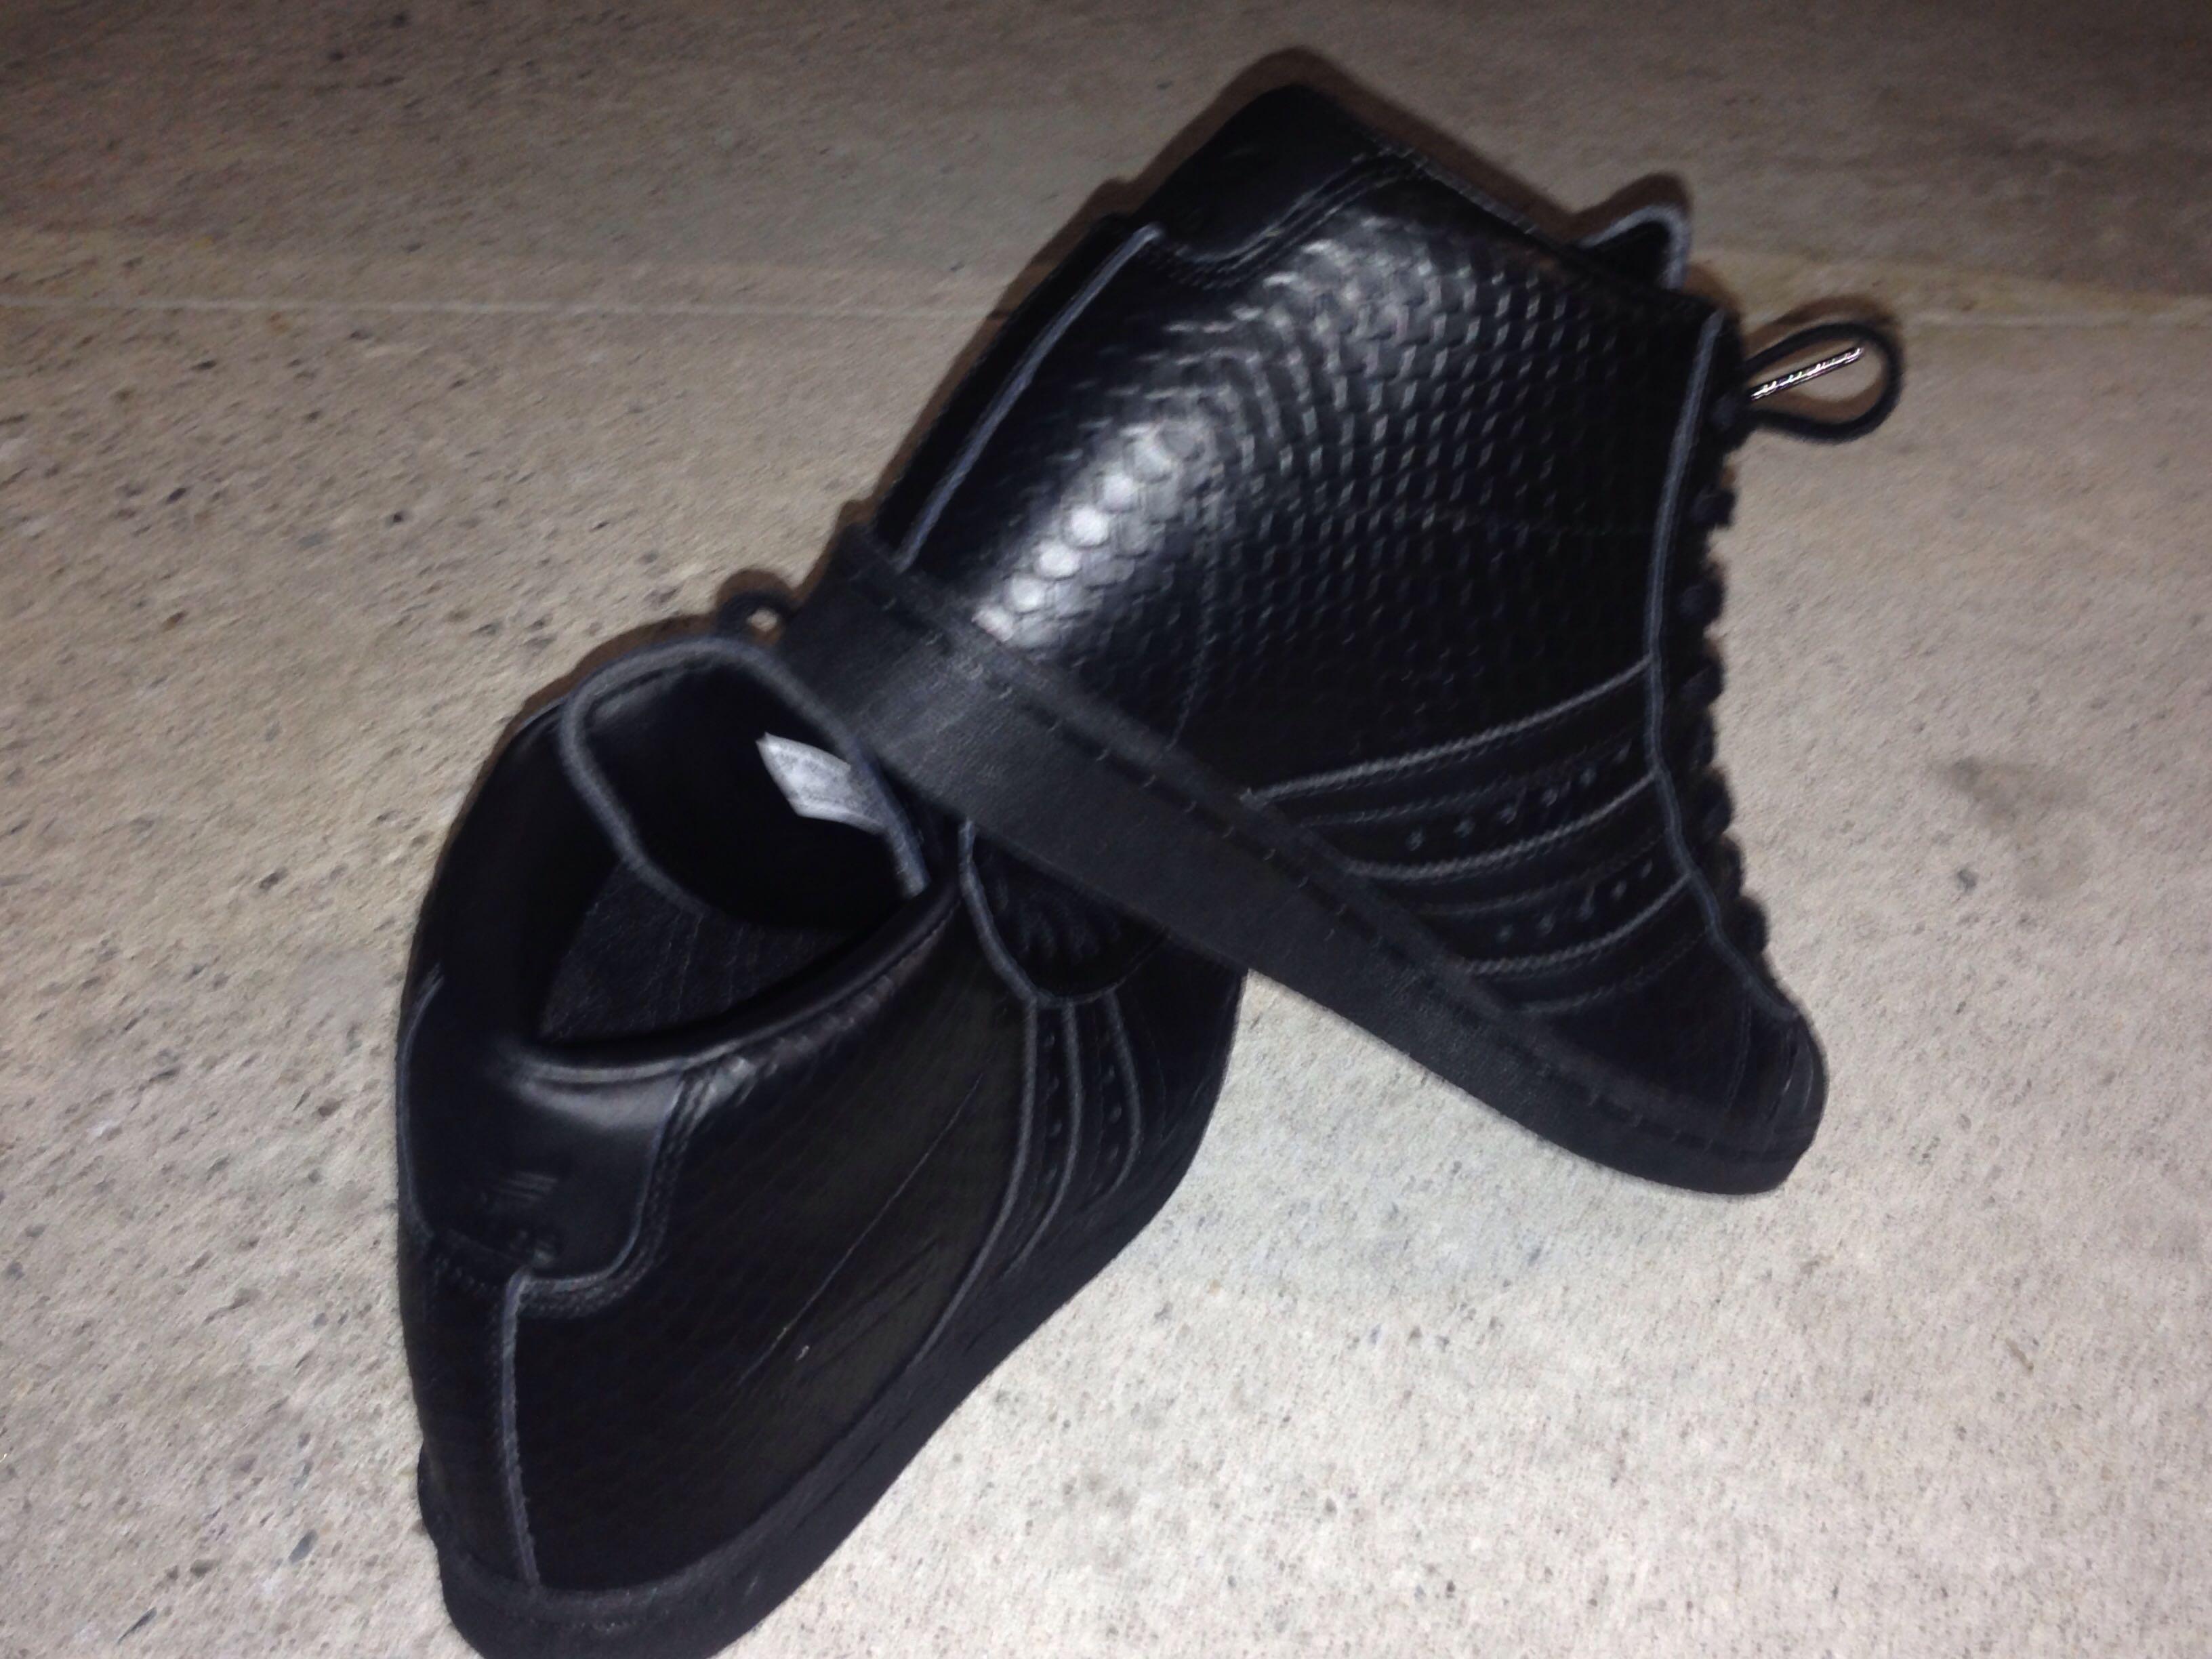 Adidas Superstar Up Black Snakeskin Wedge Sneaker, Women's